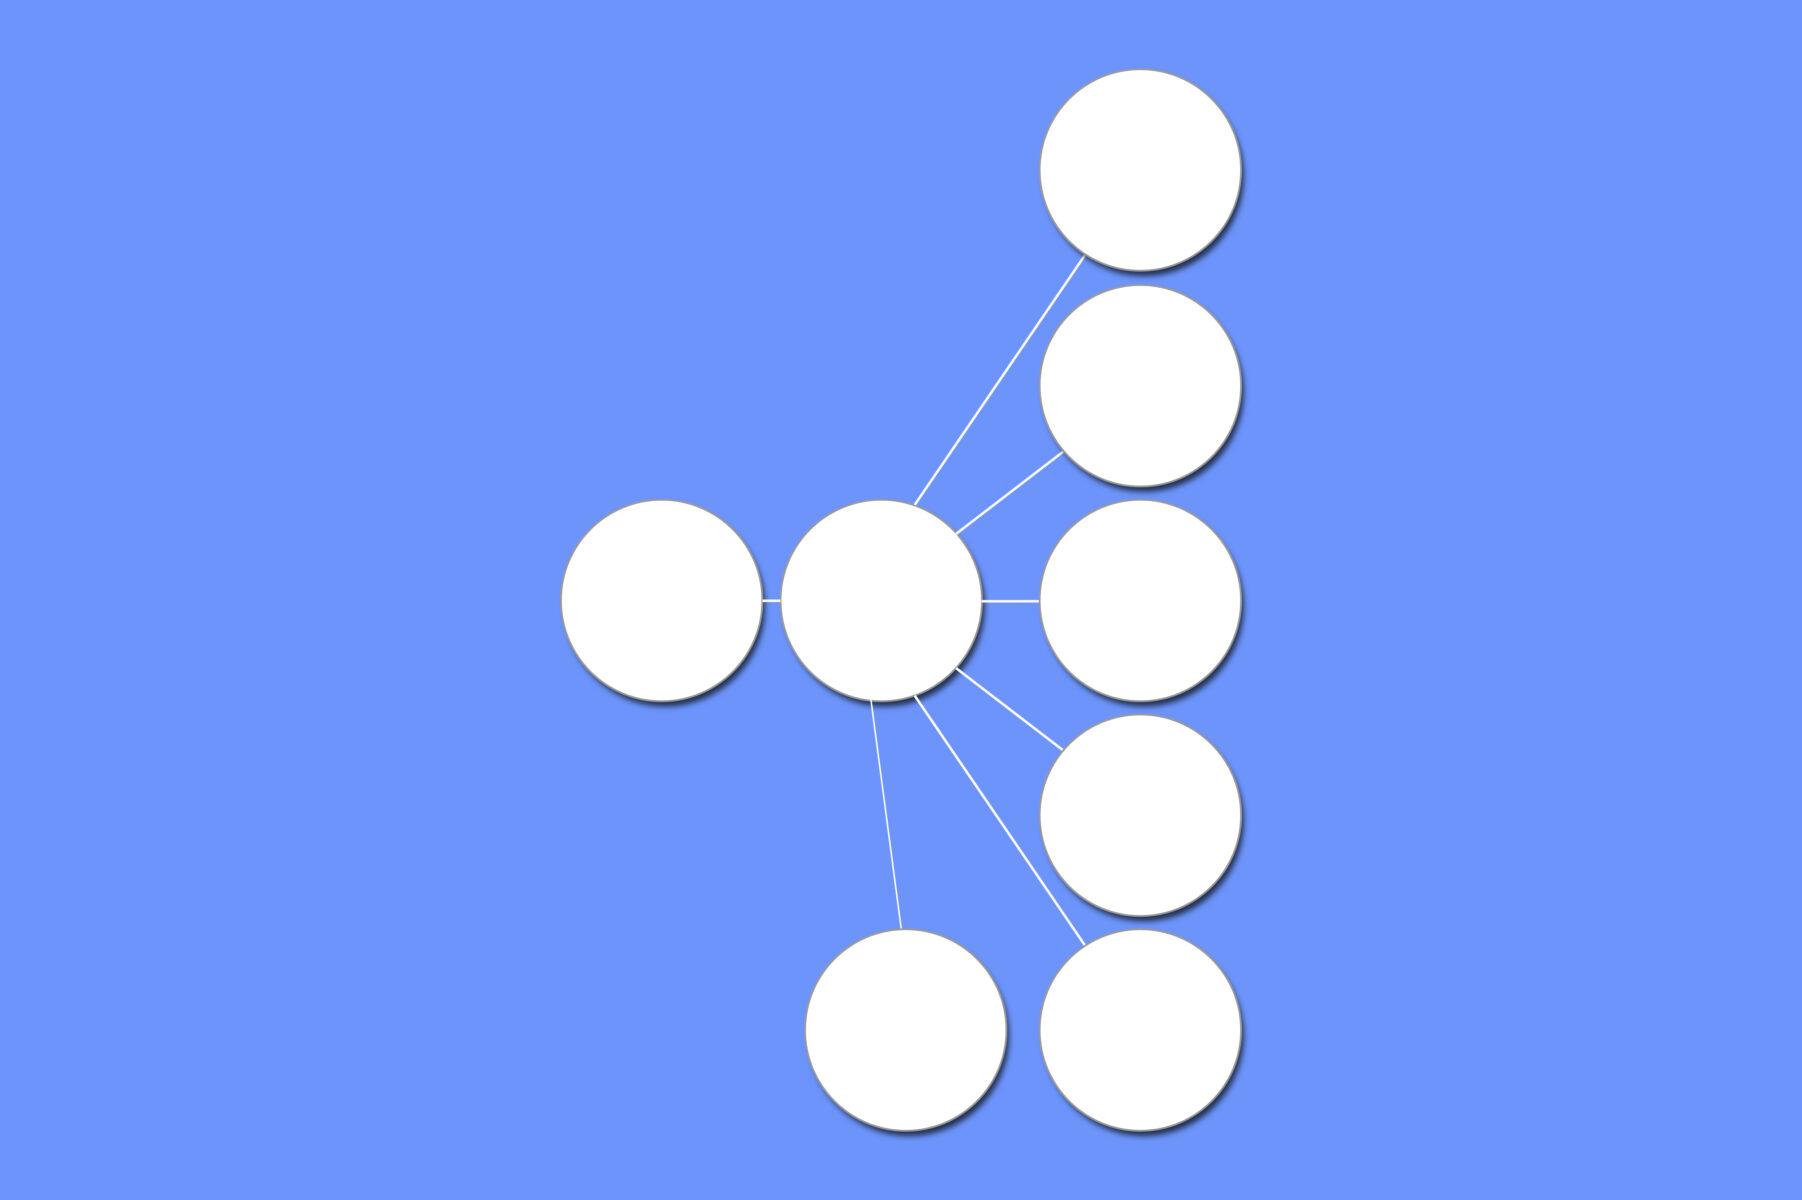 Fair Internet - The APOOS project